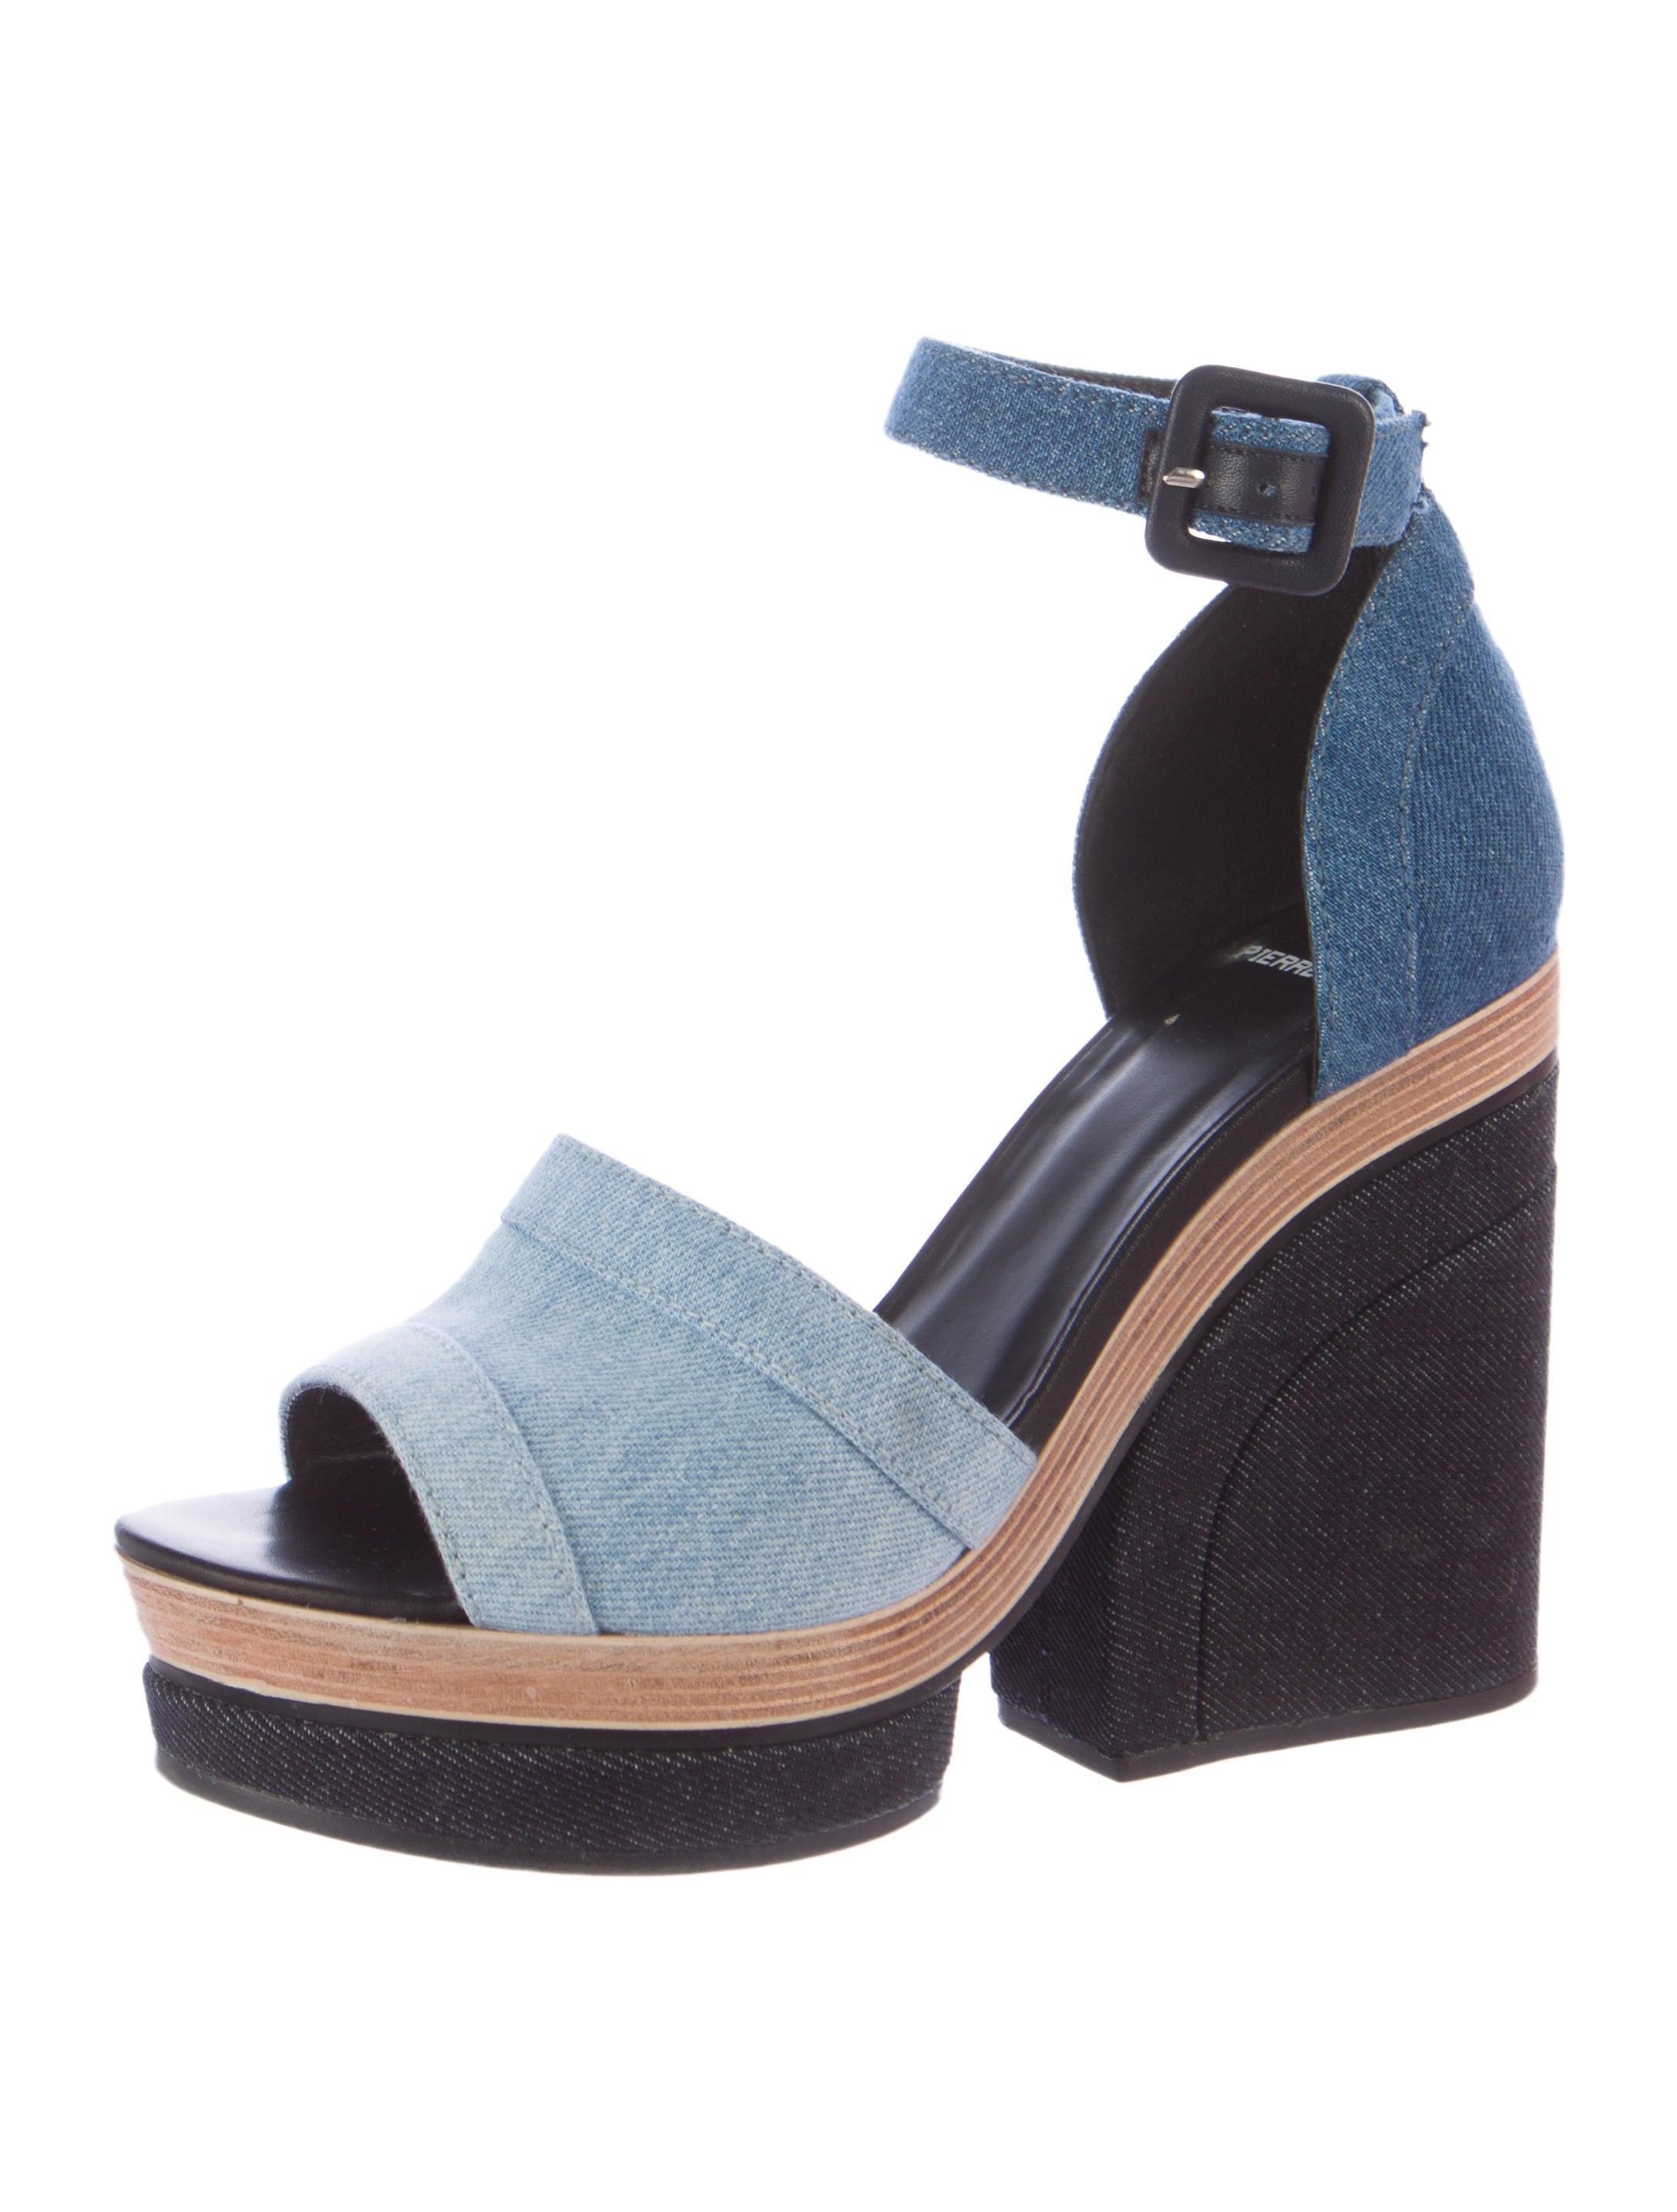 hardy denim platform sandals shoes pie22322